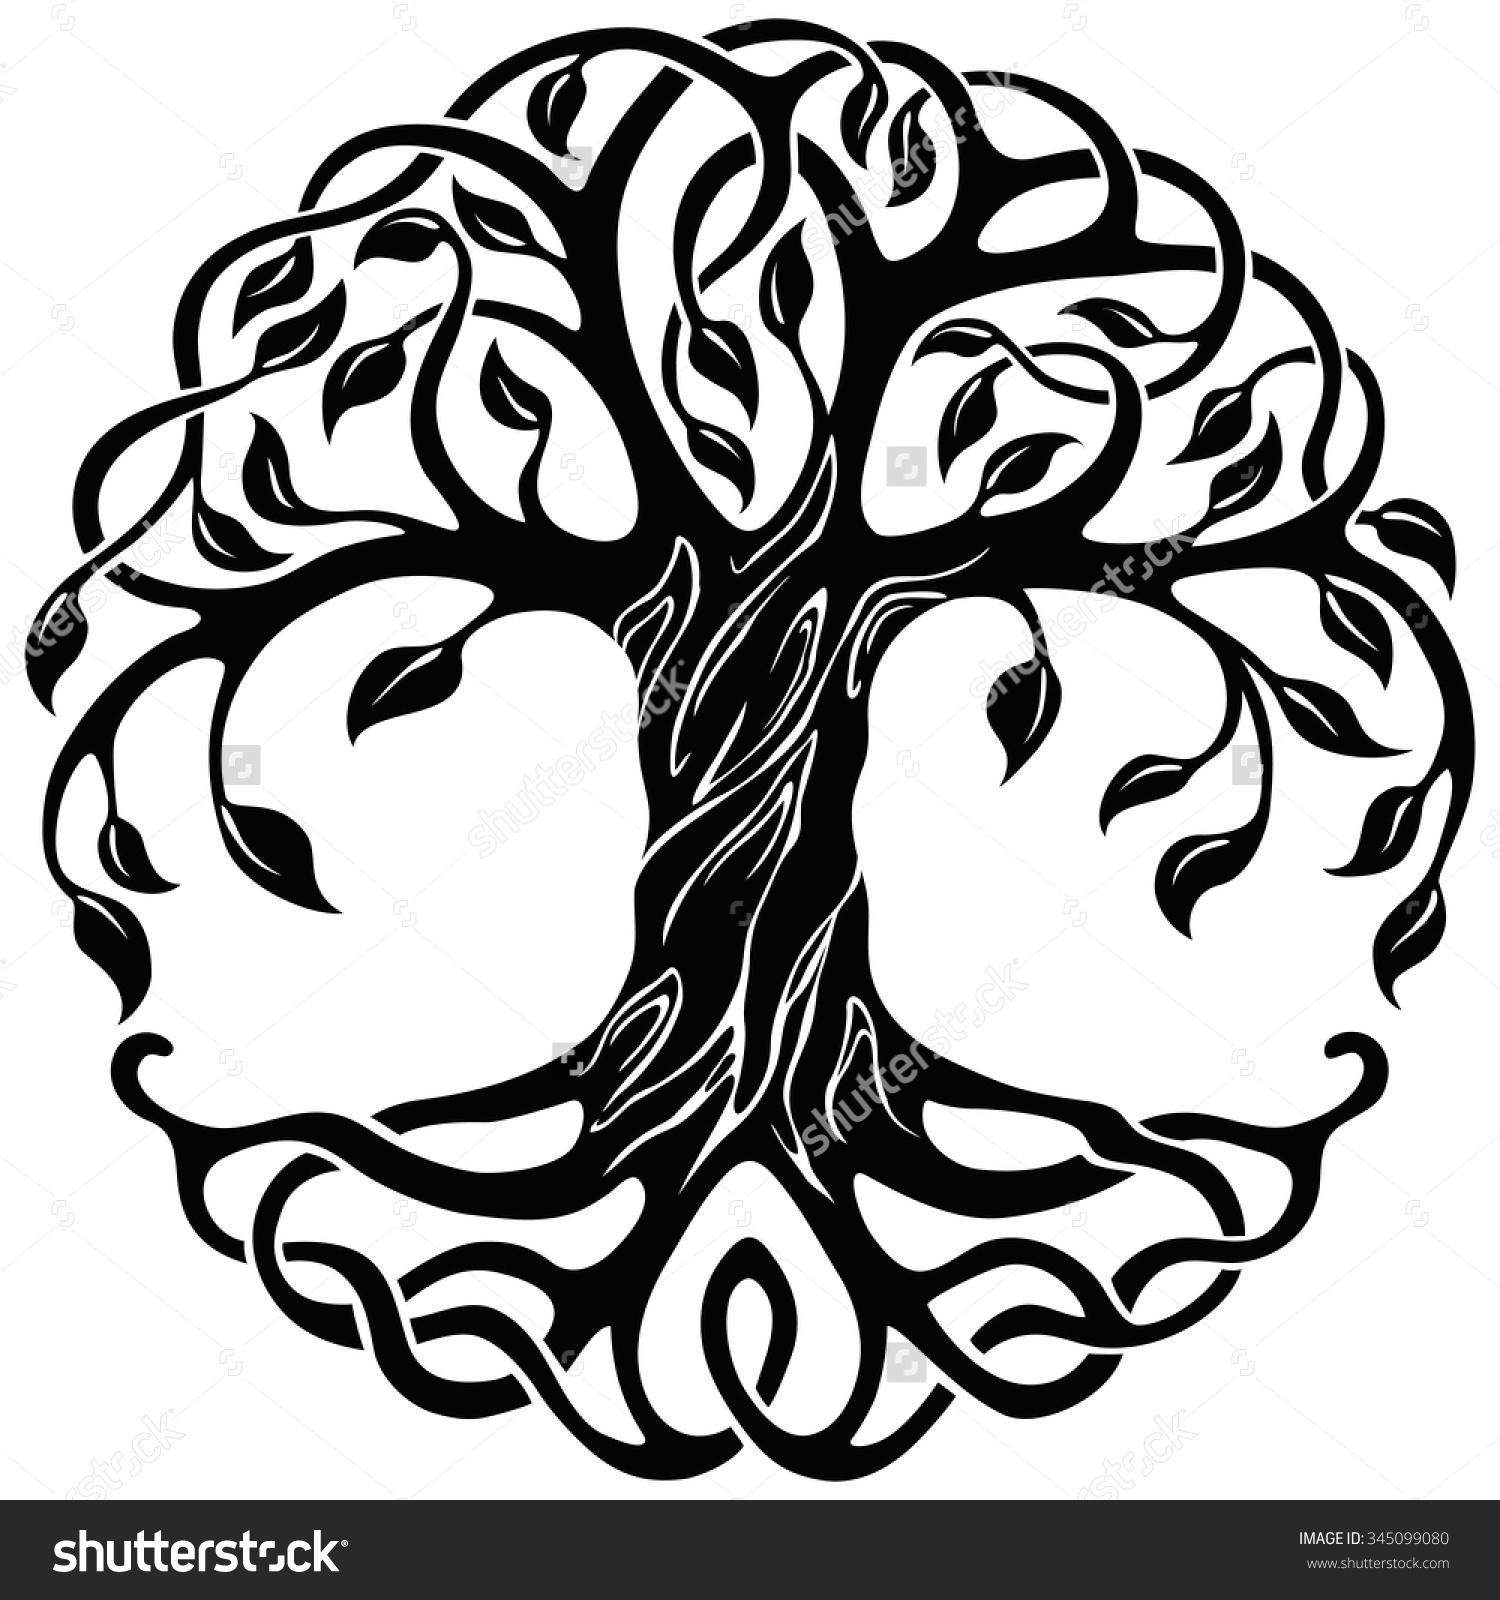 1500x1600 Celtic Tree Of Life Drawing Celtic Knot Clipart Celtic Tree Life